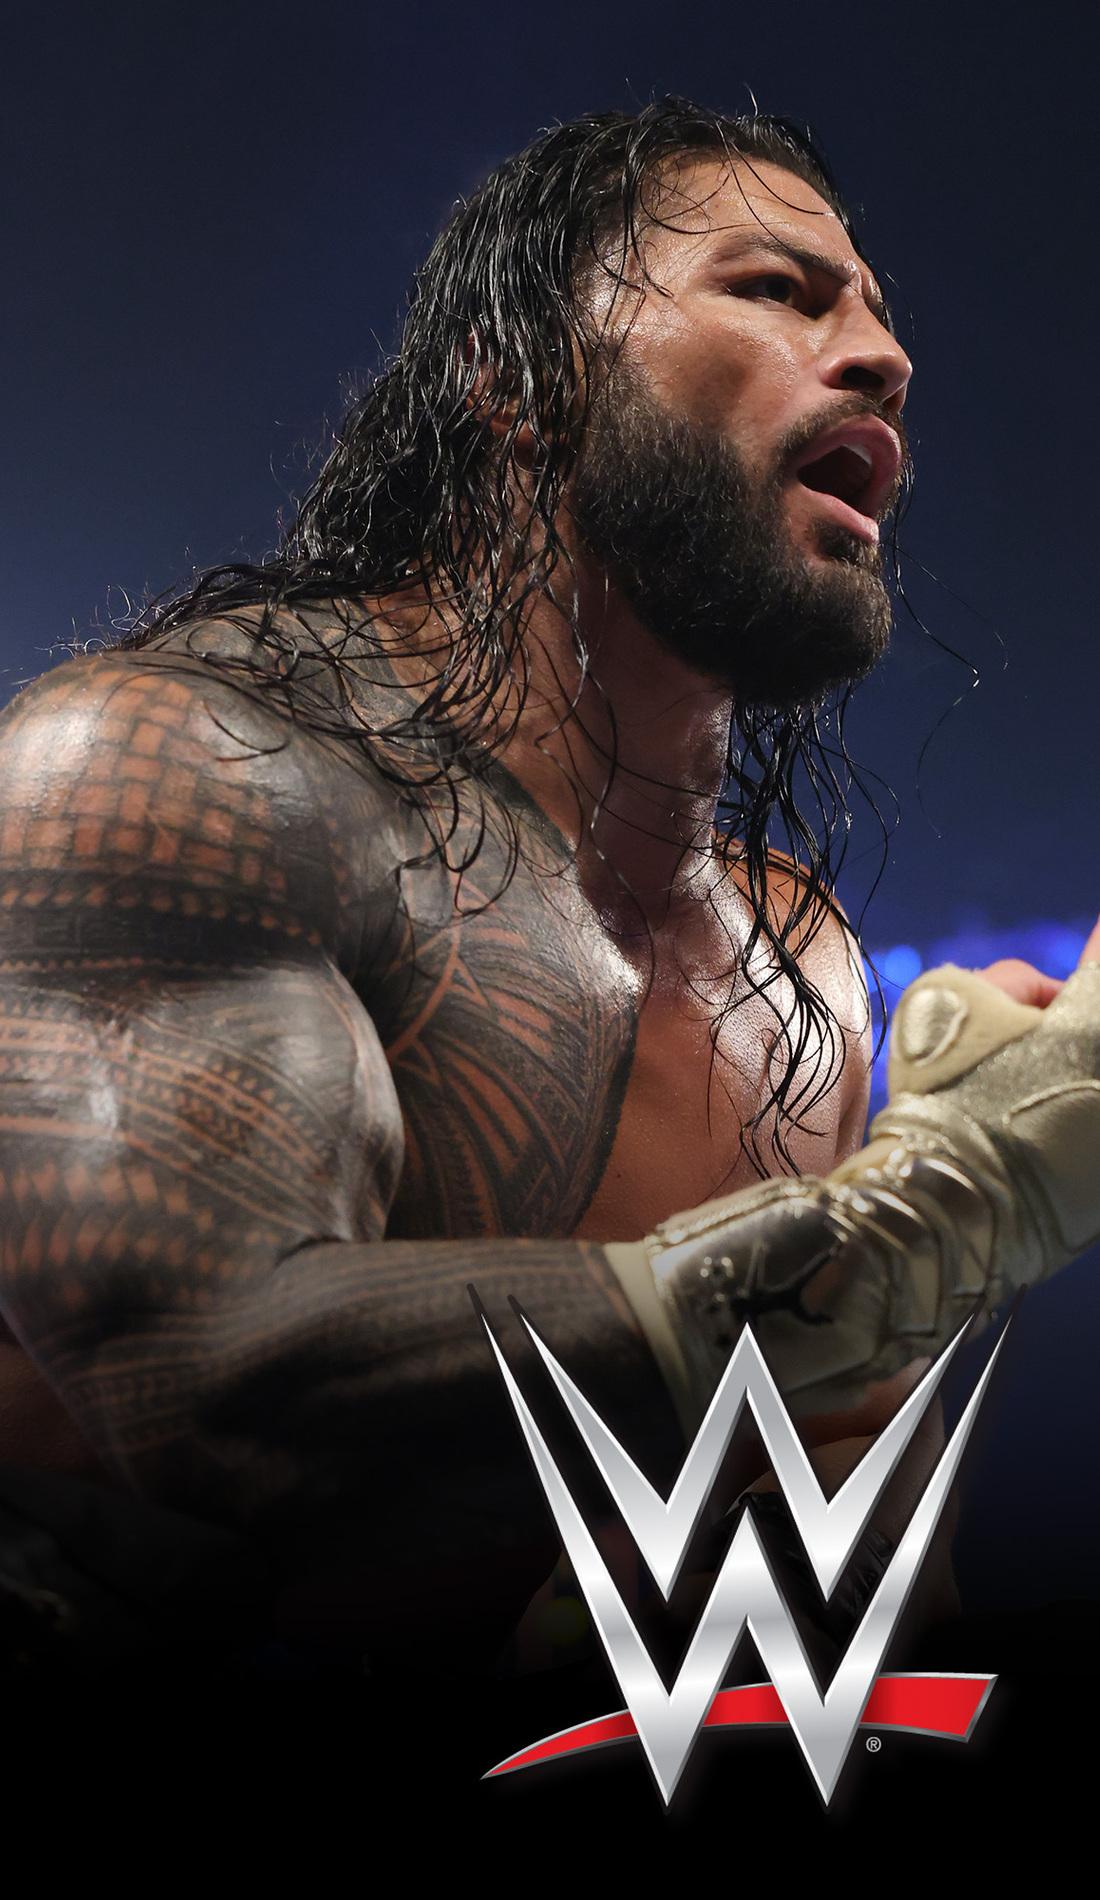 A WWE live event